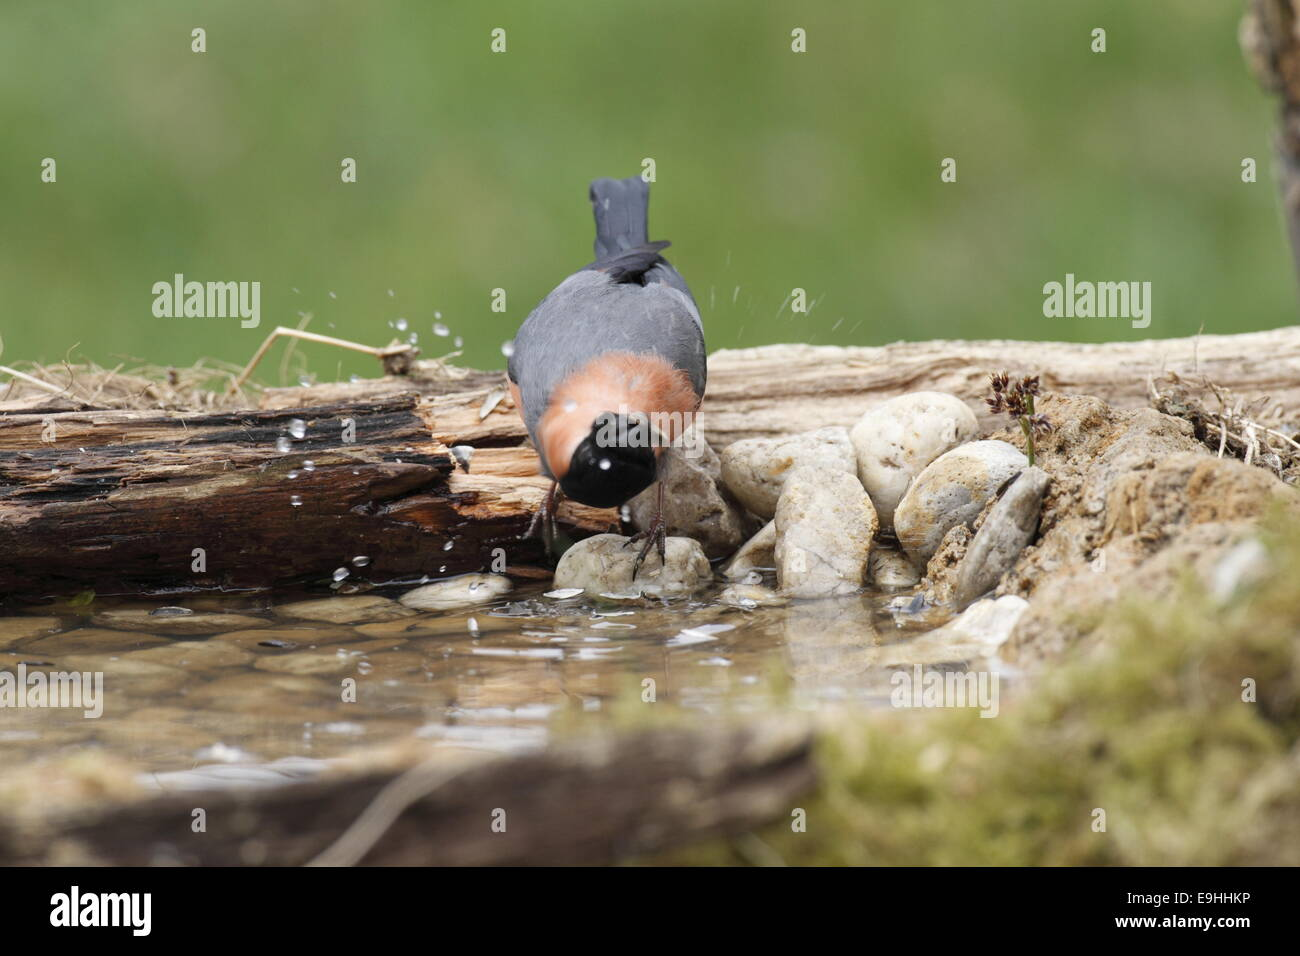 Common Bullfinch drinking water Stock Photo